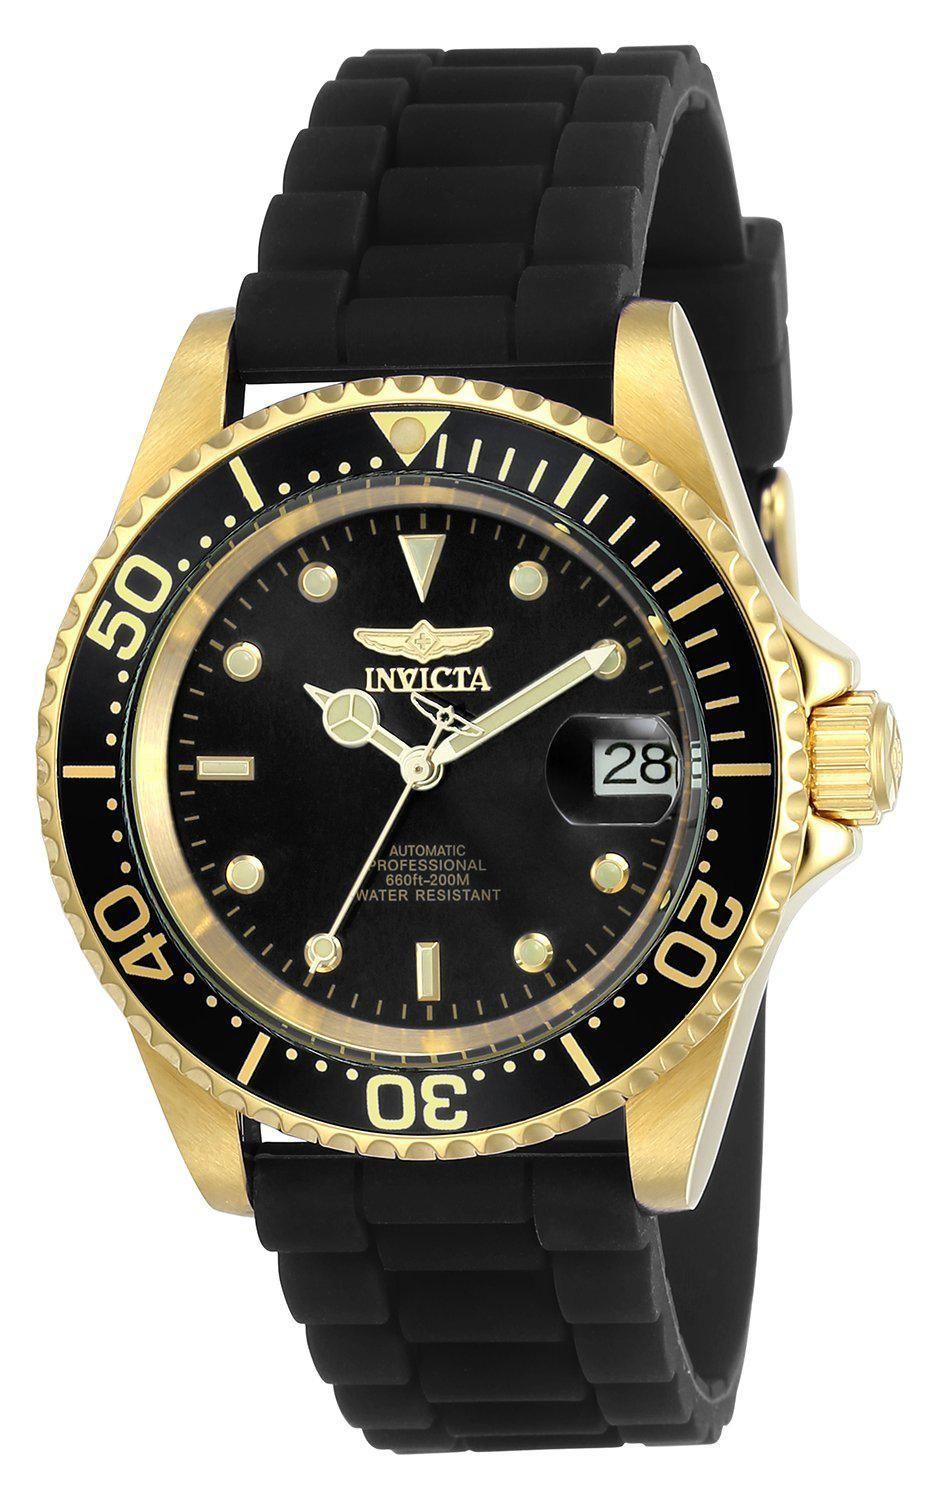 e9d836a07 Invicta Pro Diver Men's 40mm Automatic Watch - Model 23681 ...